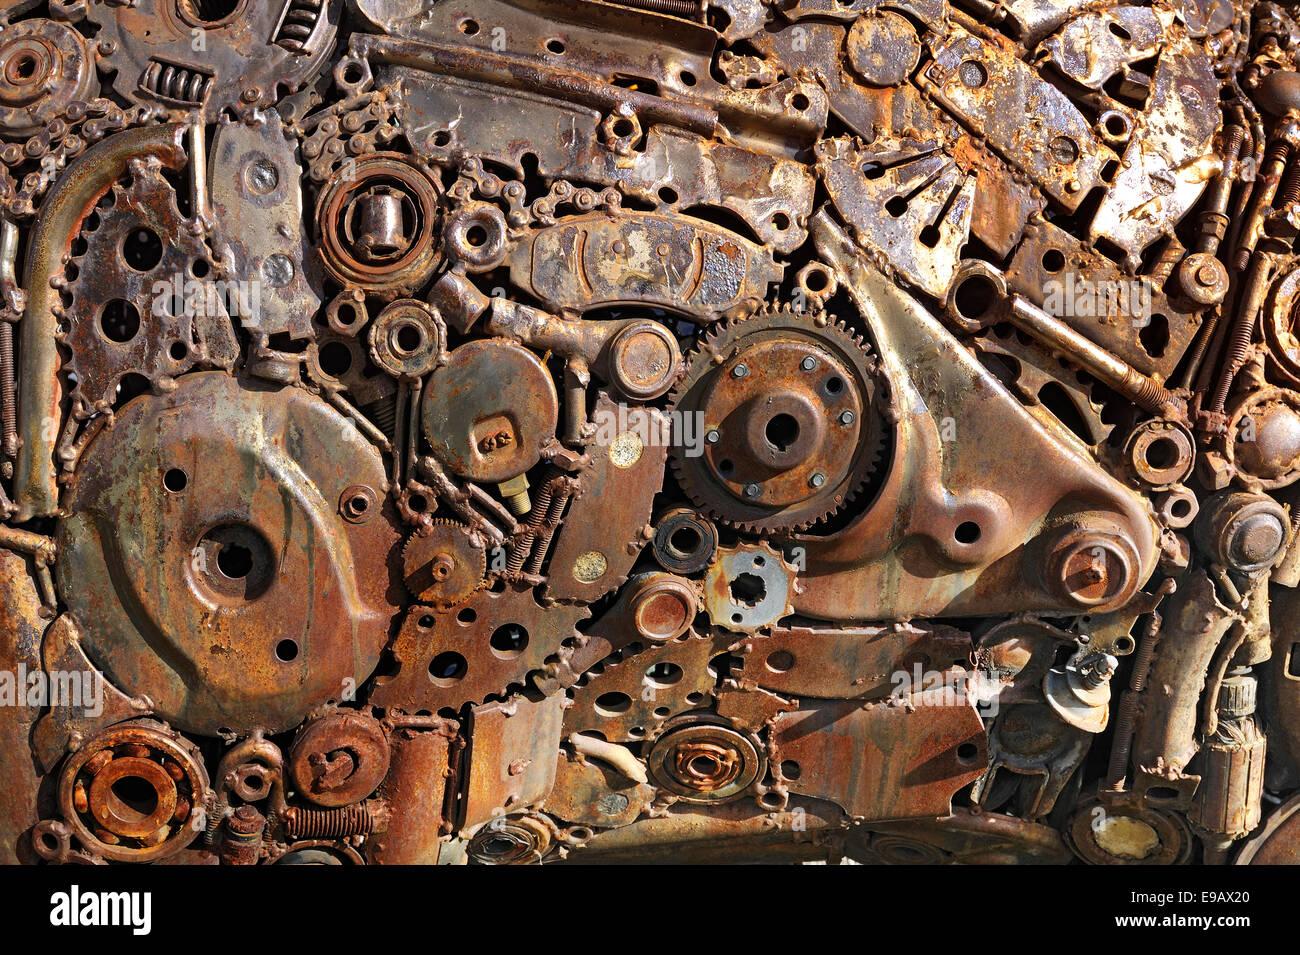 Work of art made from scrap metal - Stock Image